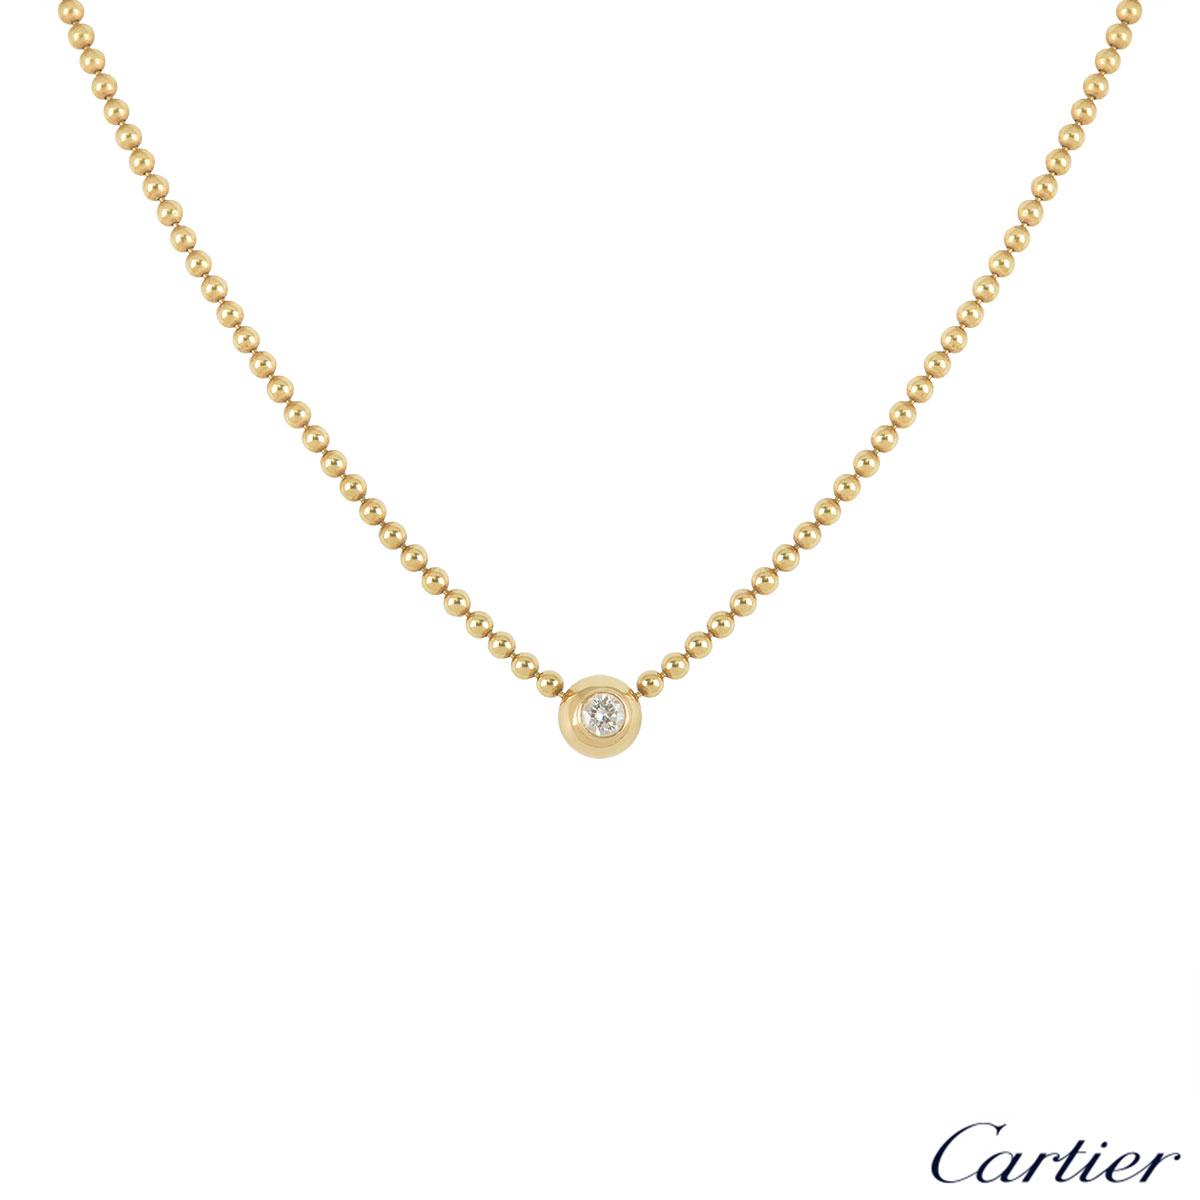 1cf258ce5cd7de Cartier Yellow Gold Diamond Beaded Necklace